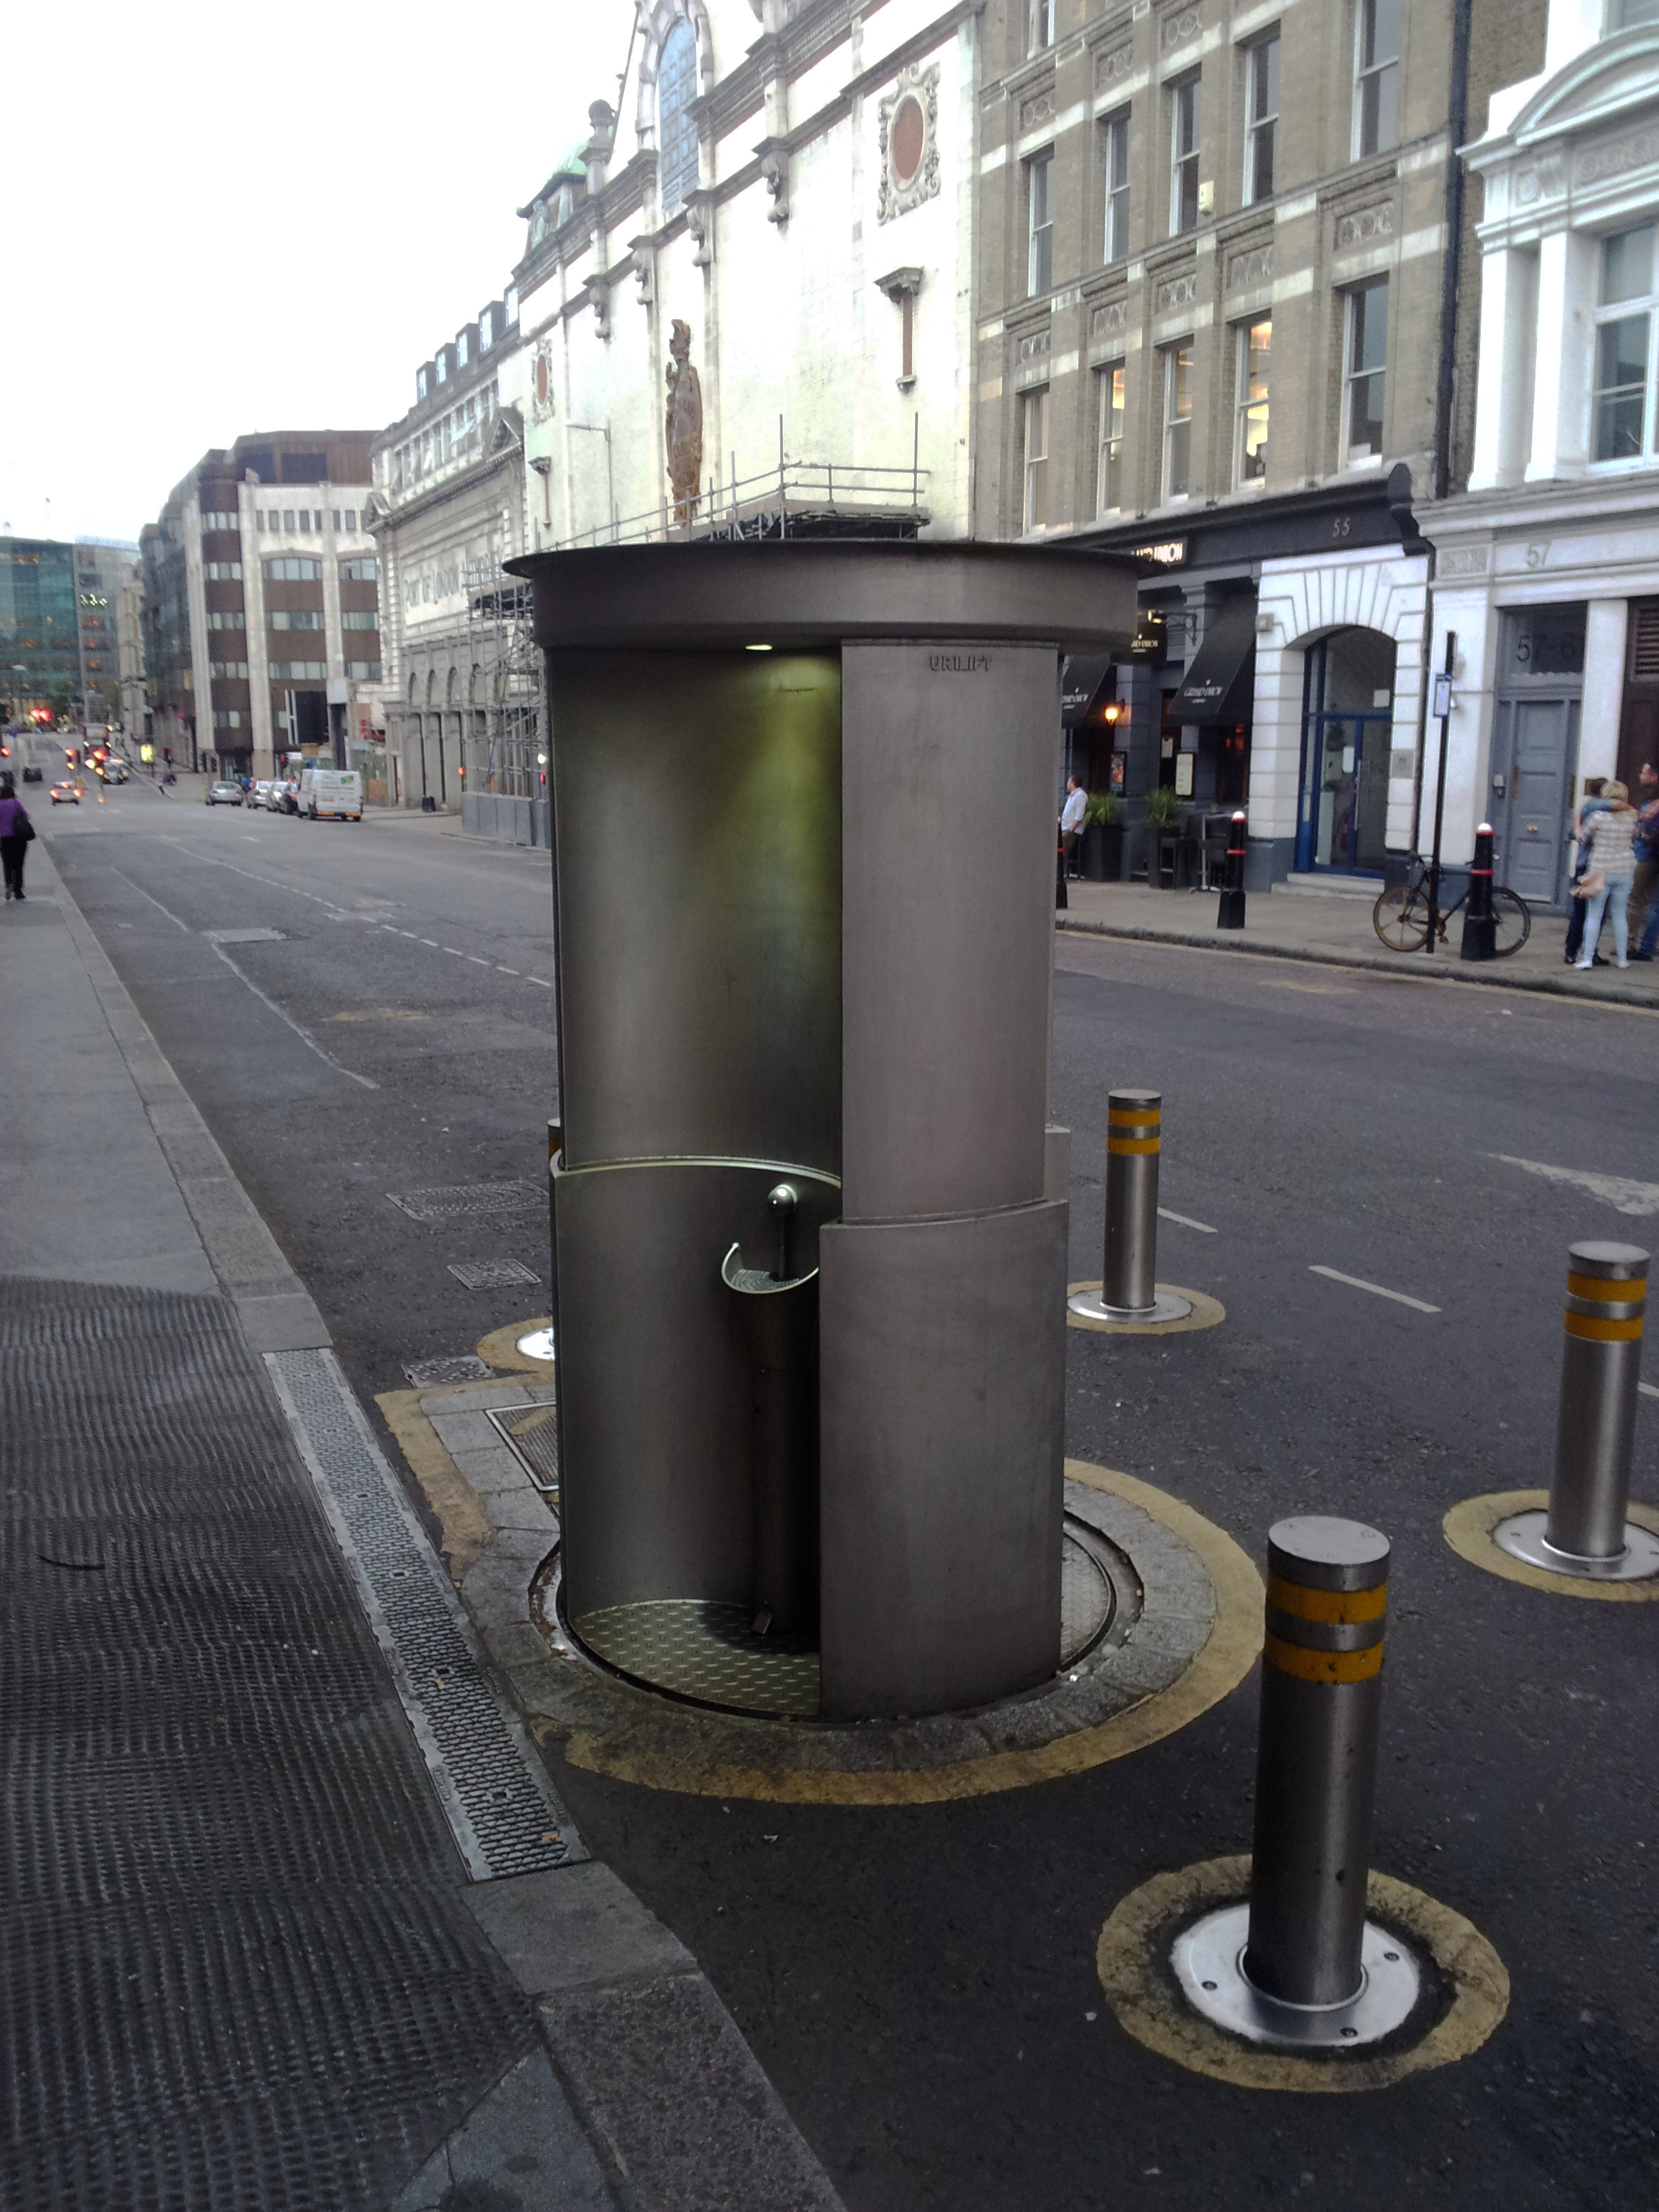 Person painting wall - File Public Urinal Urilift London Charterhouse Street Jpg Wikimedia